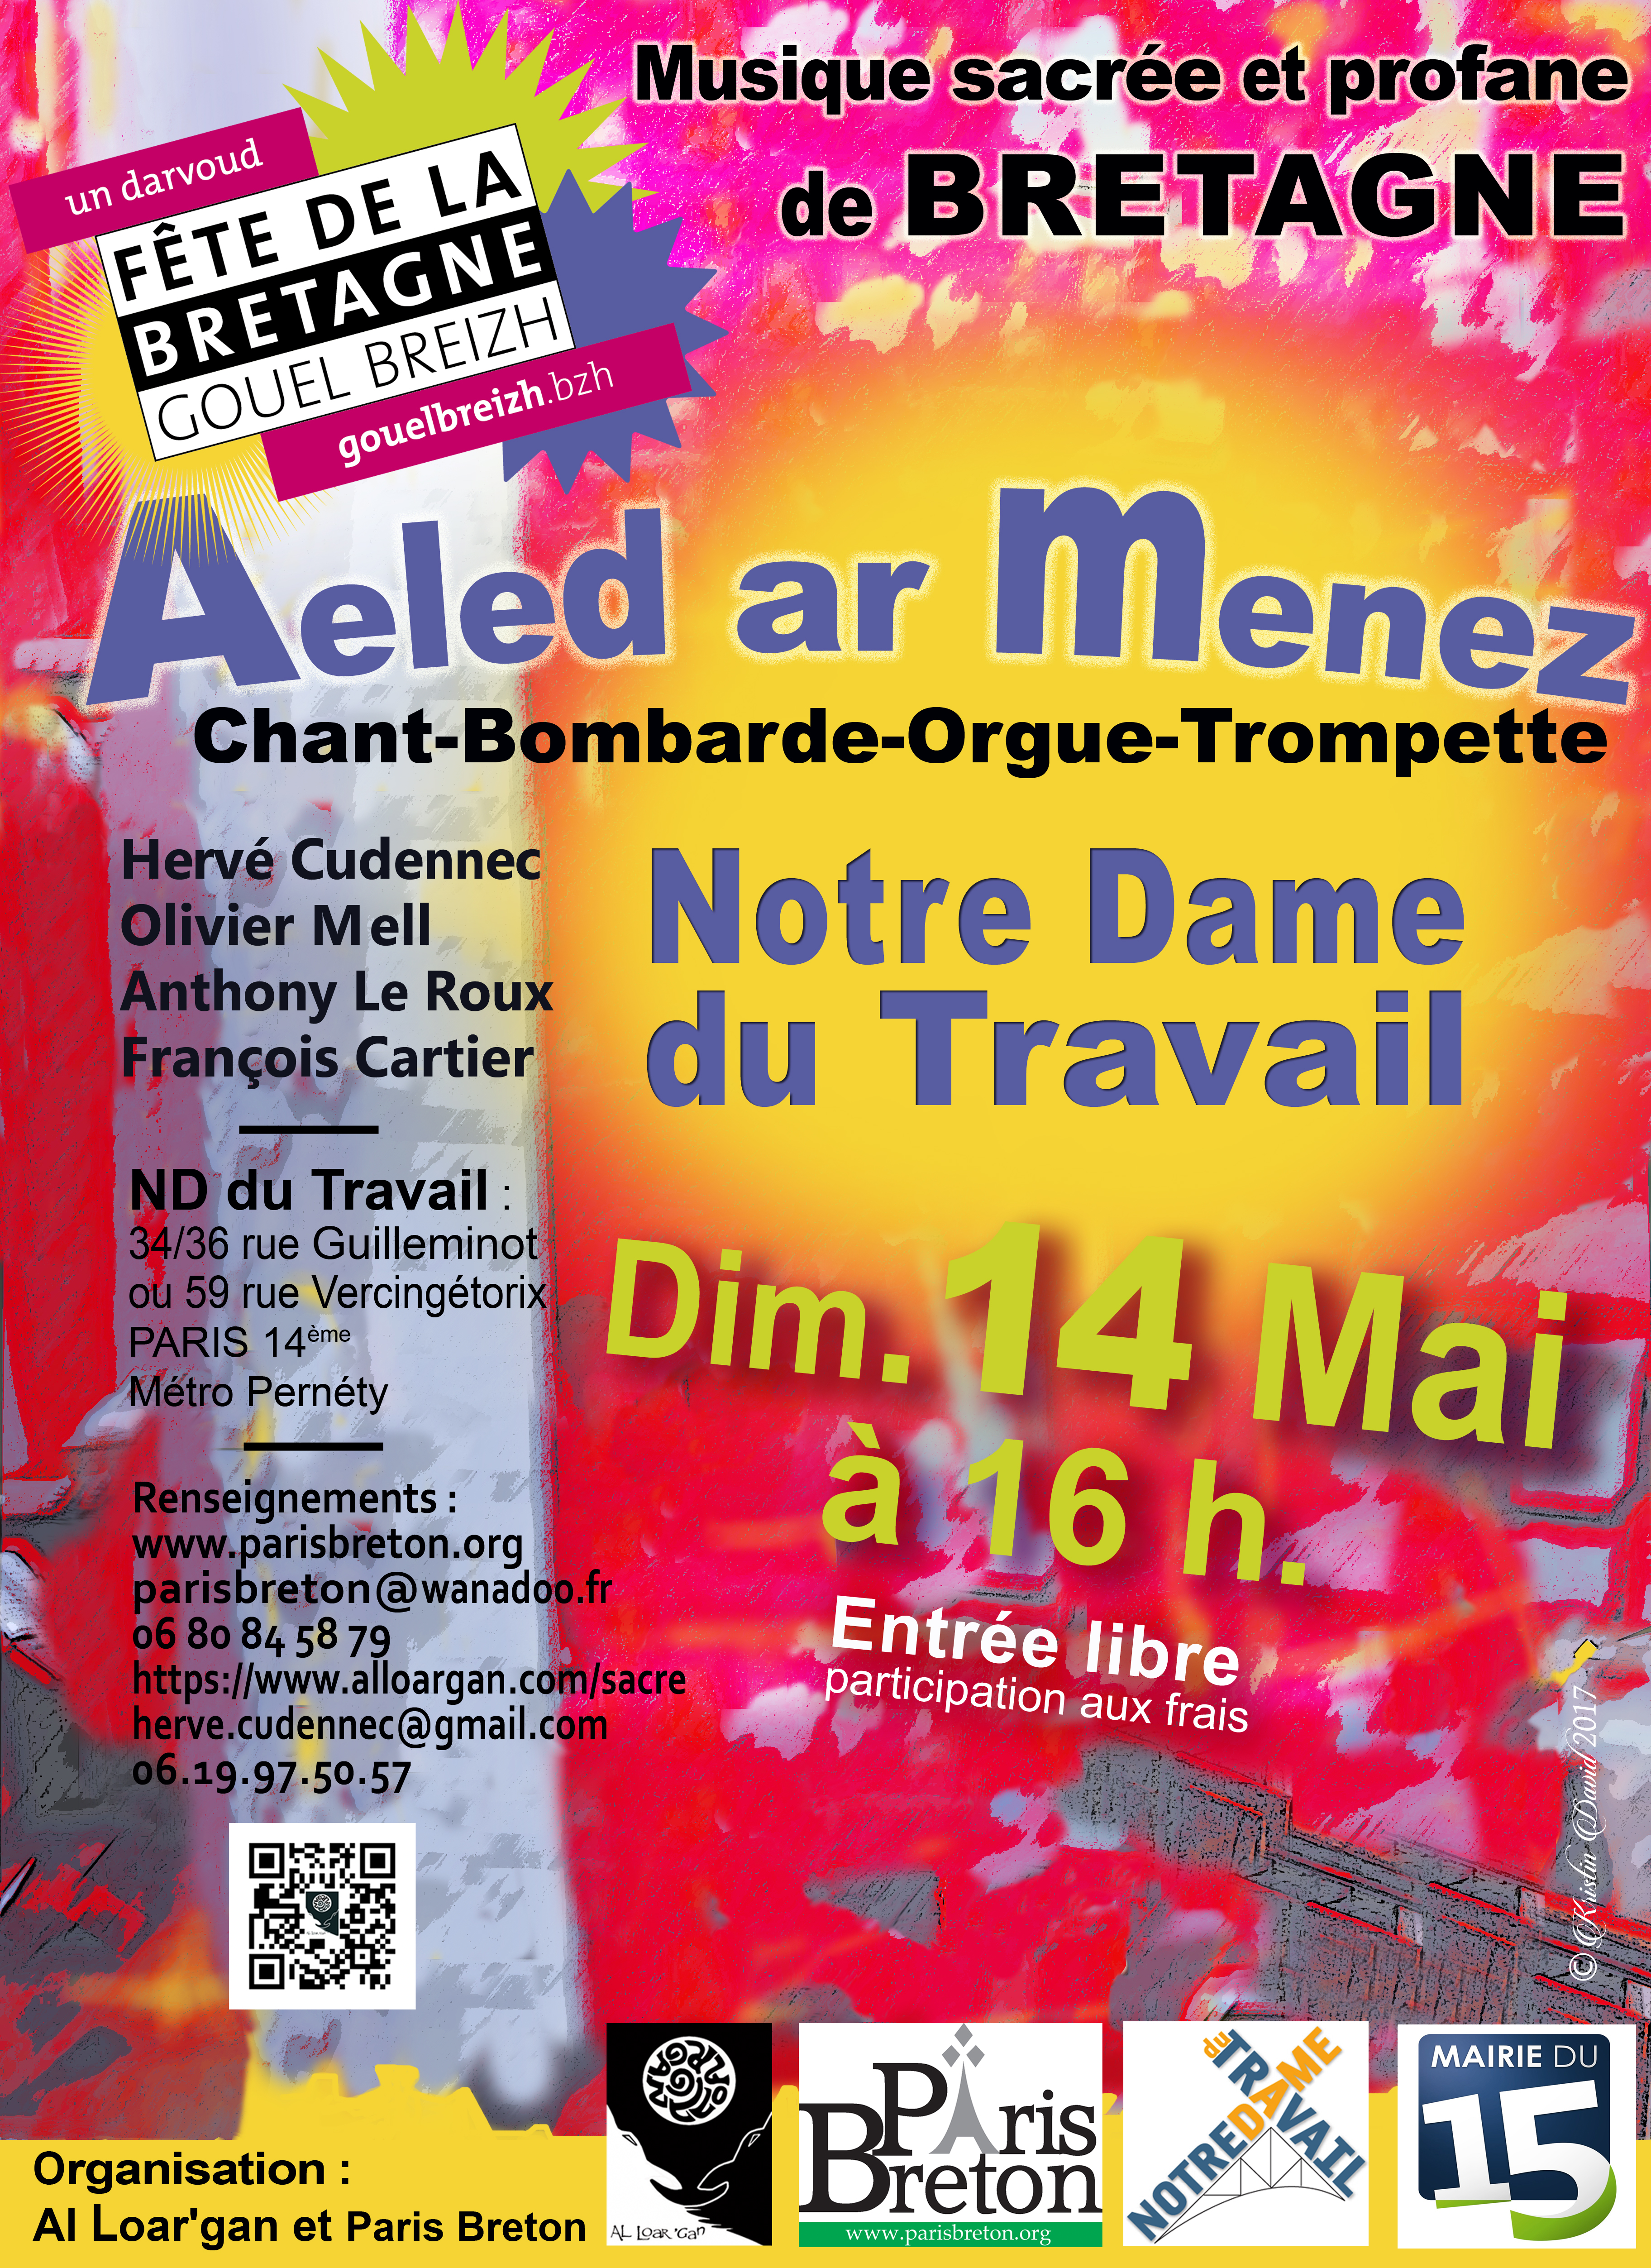 Concert Aeled ar Menez_ND Travail_14 mai 2017